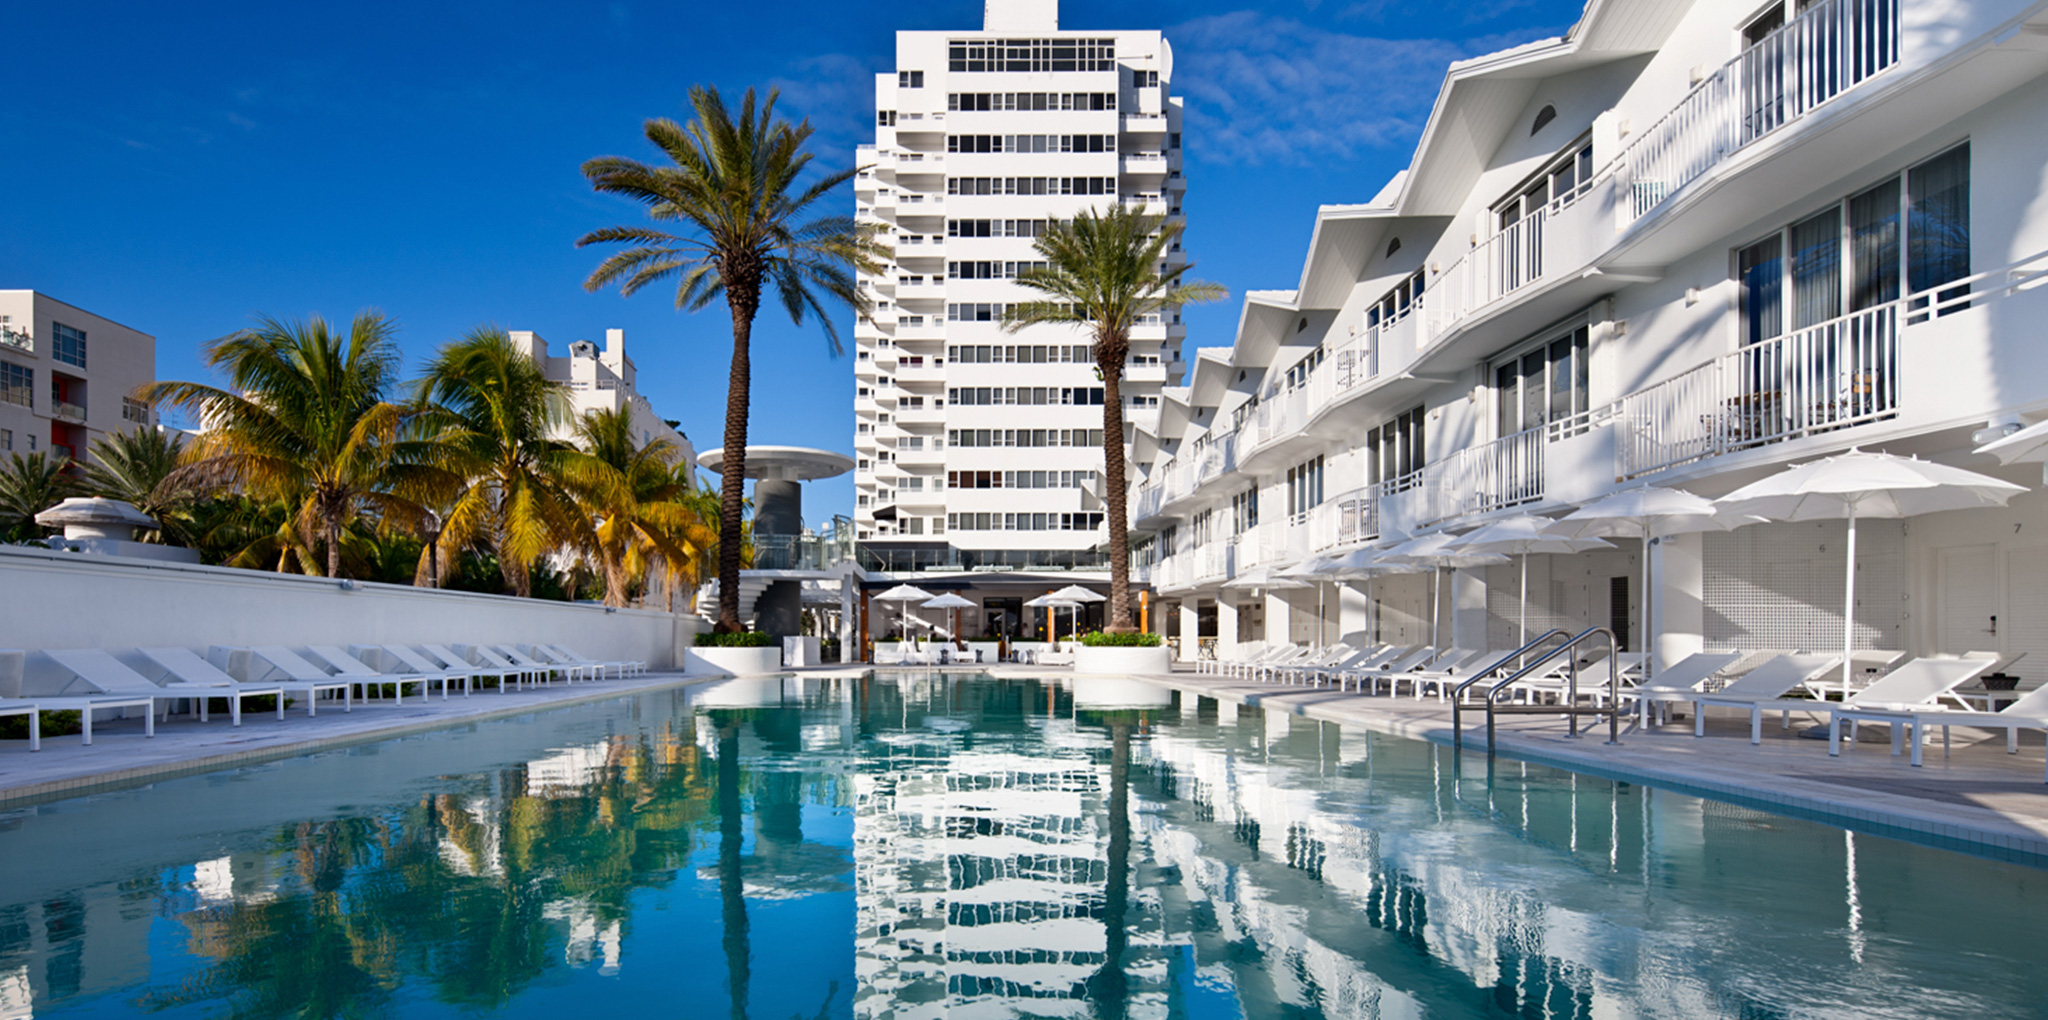 Shelborne Hotel Miami Music Week